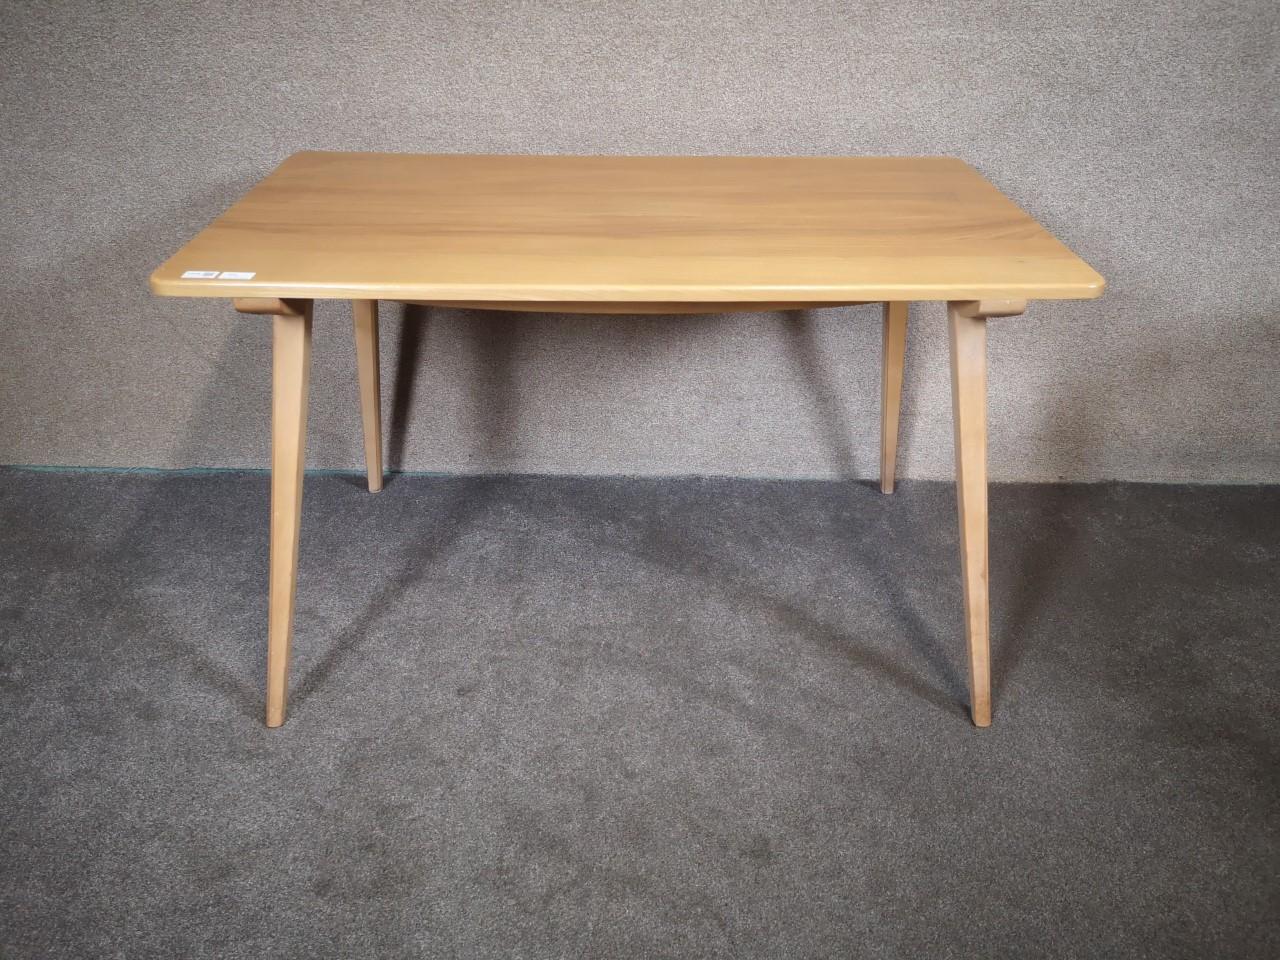 Ercol table画像